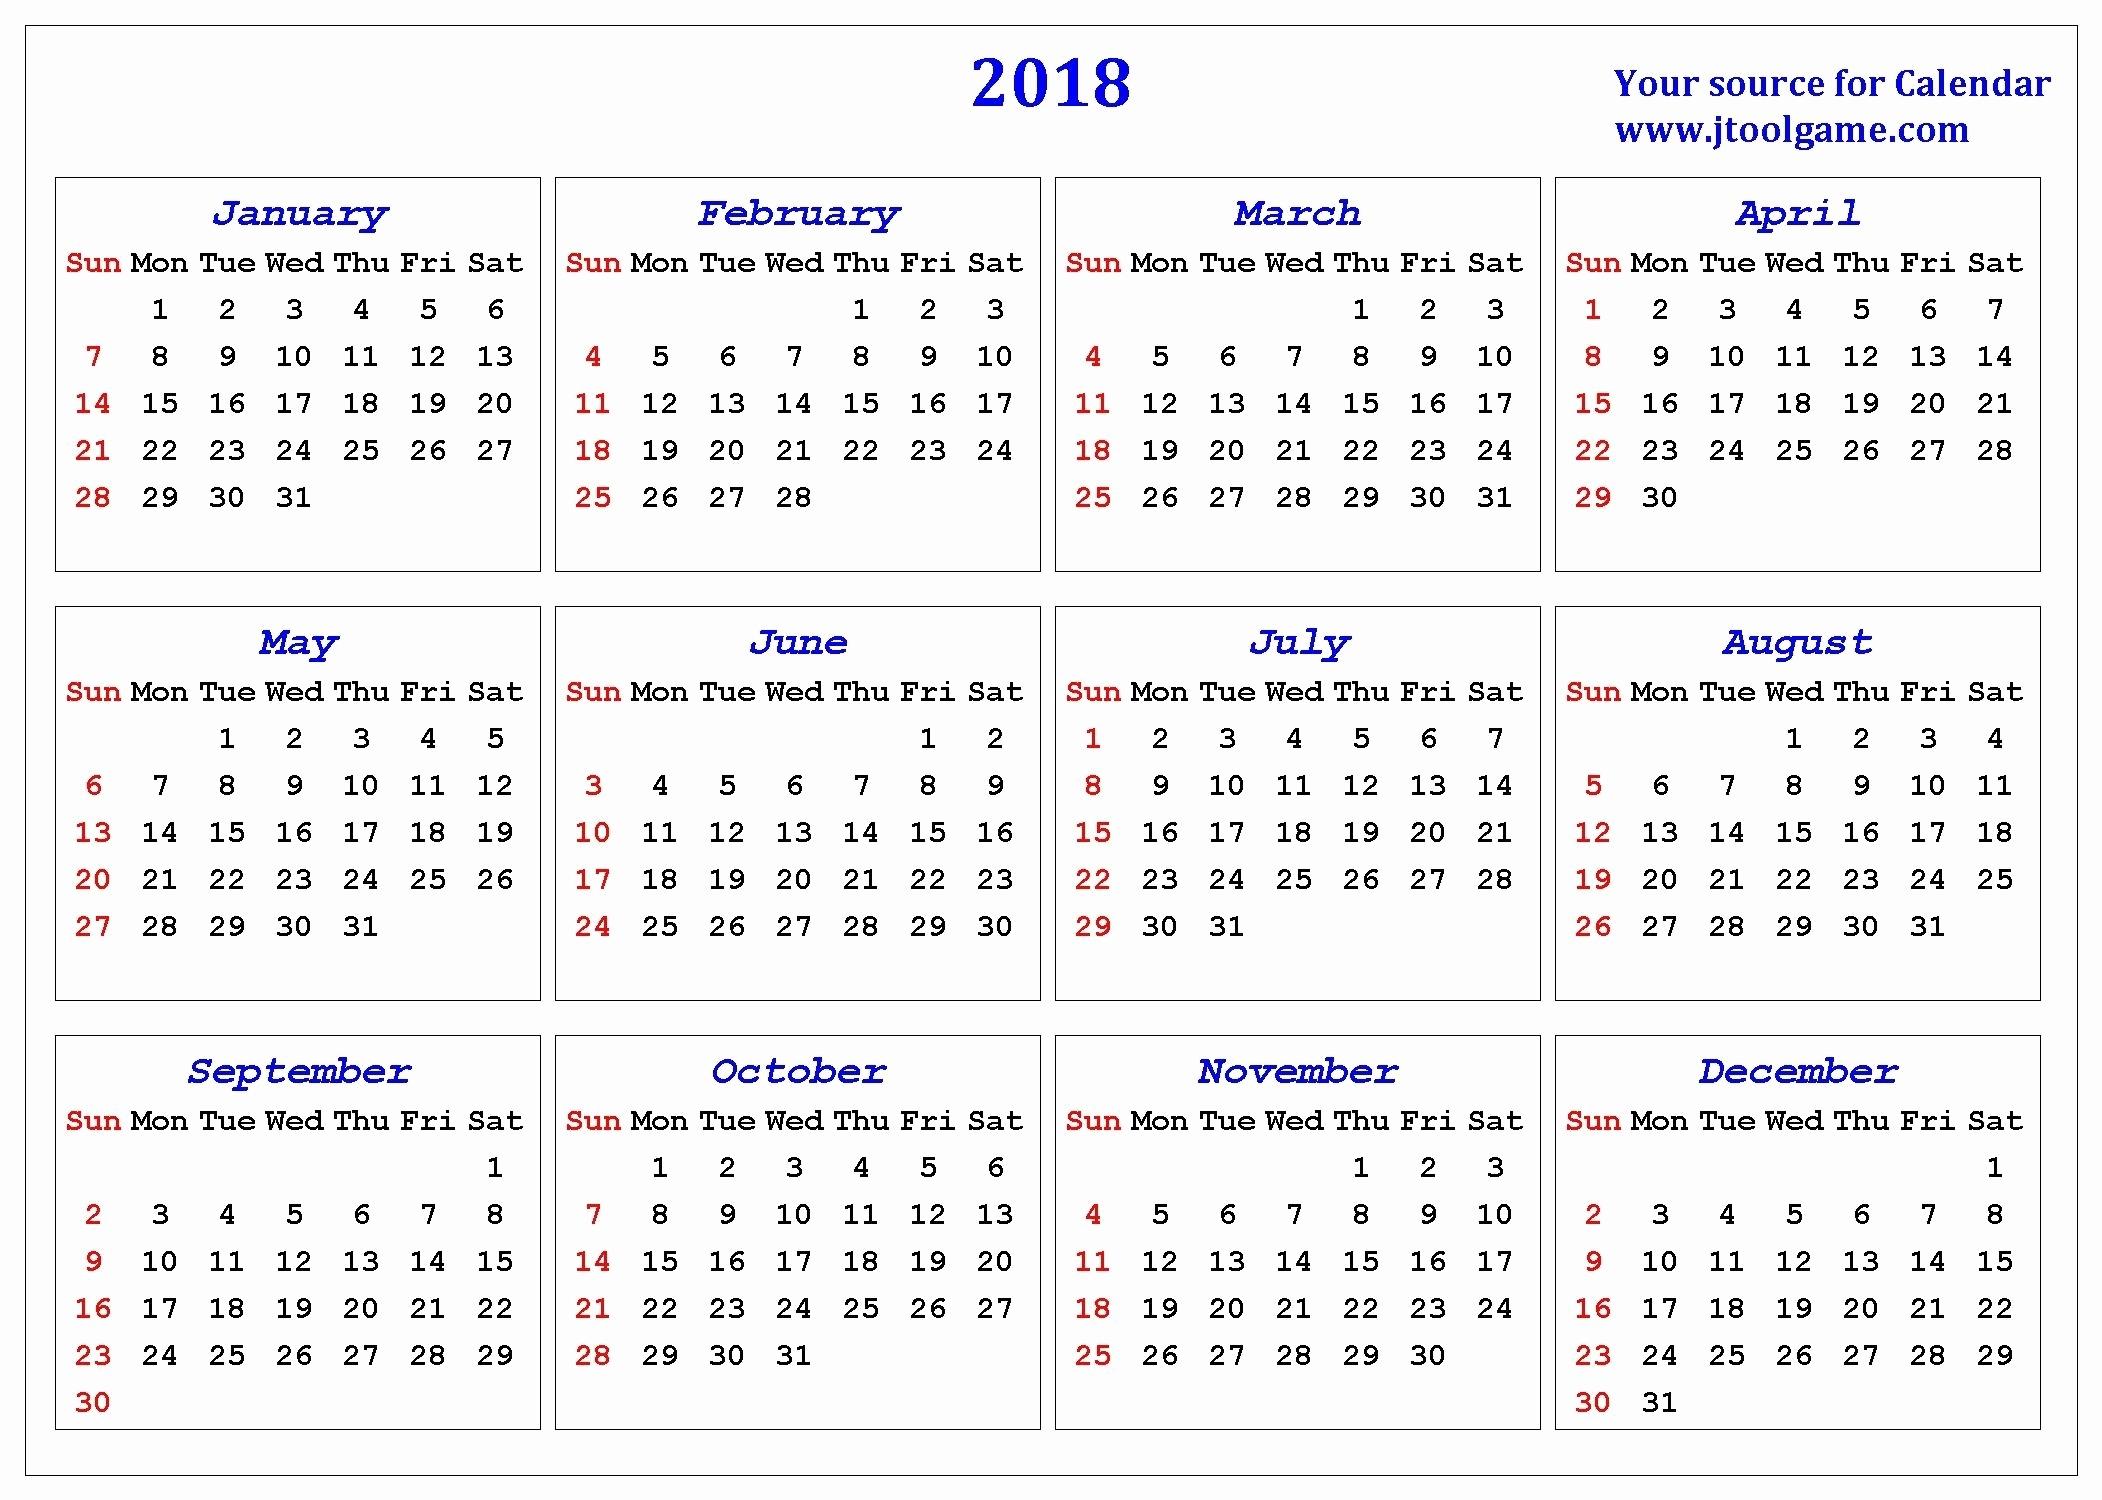 Calendar With Week Numbers - Cerno.mioduchowski